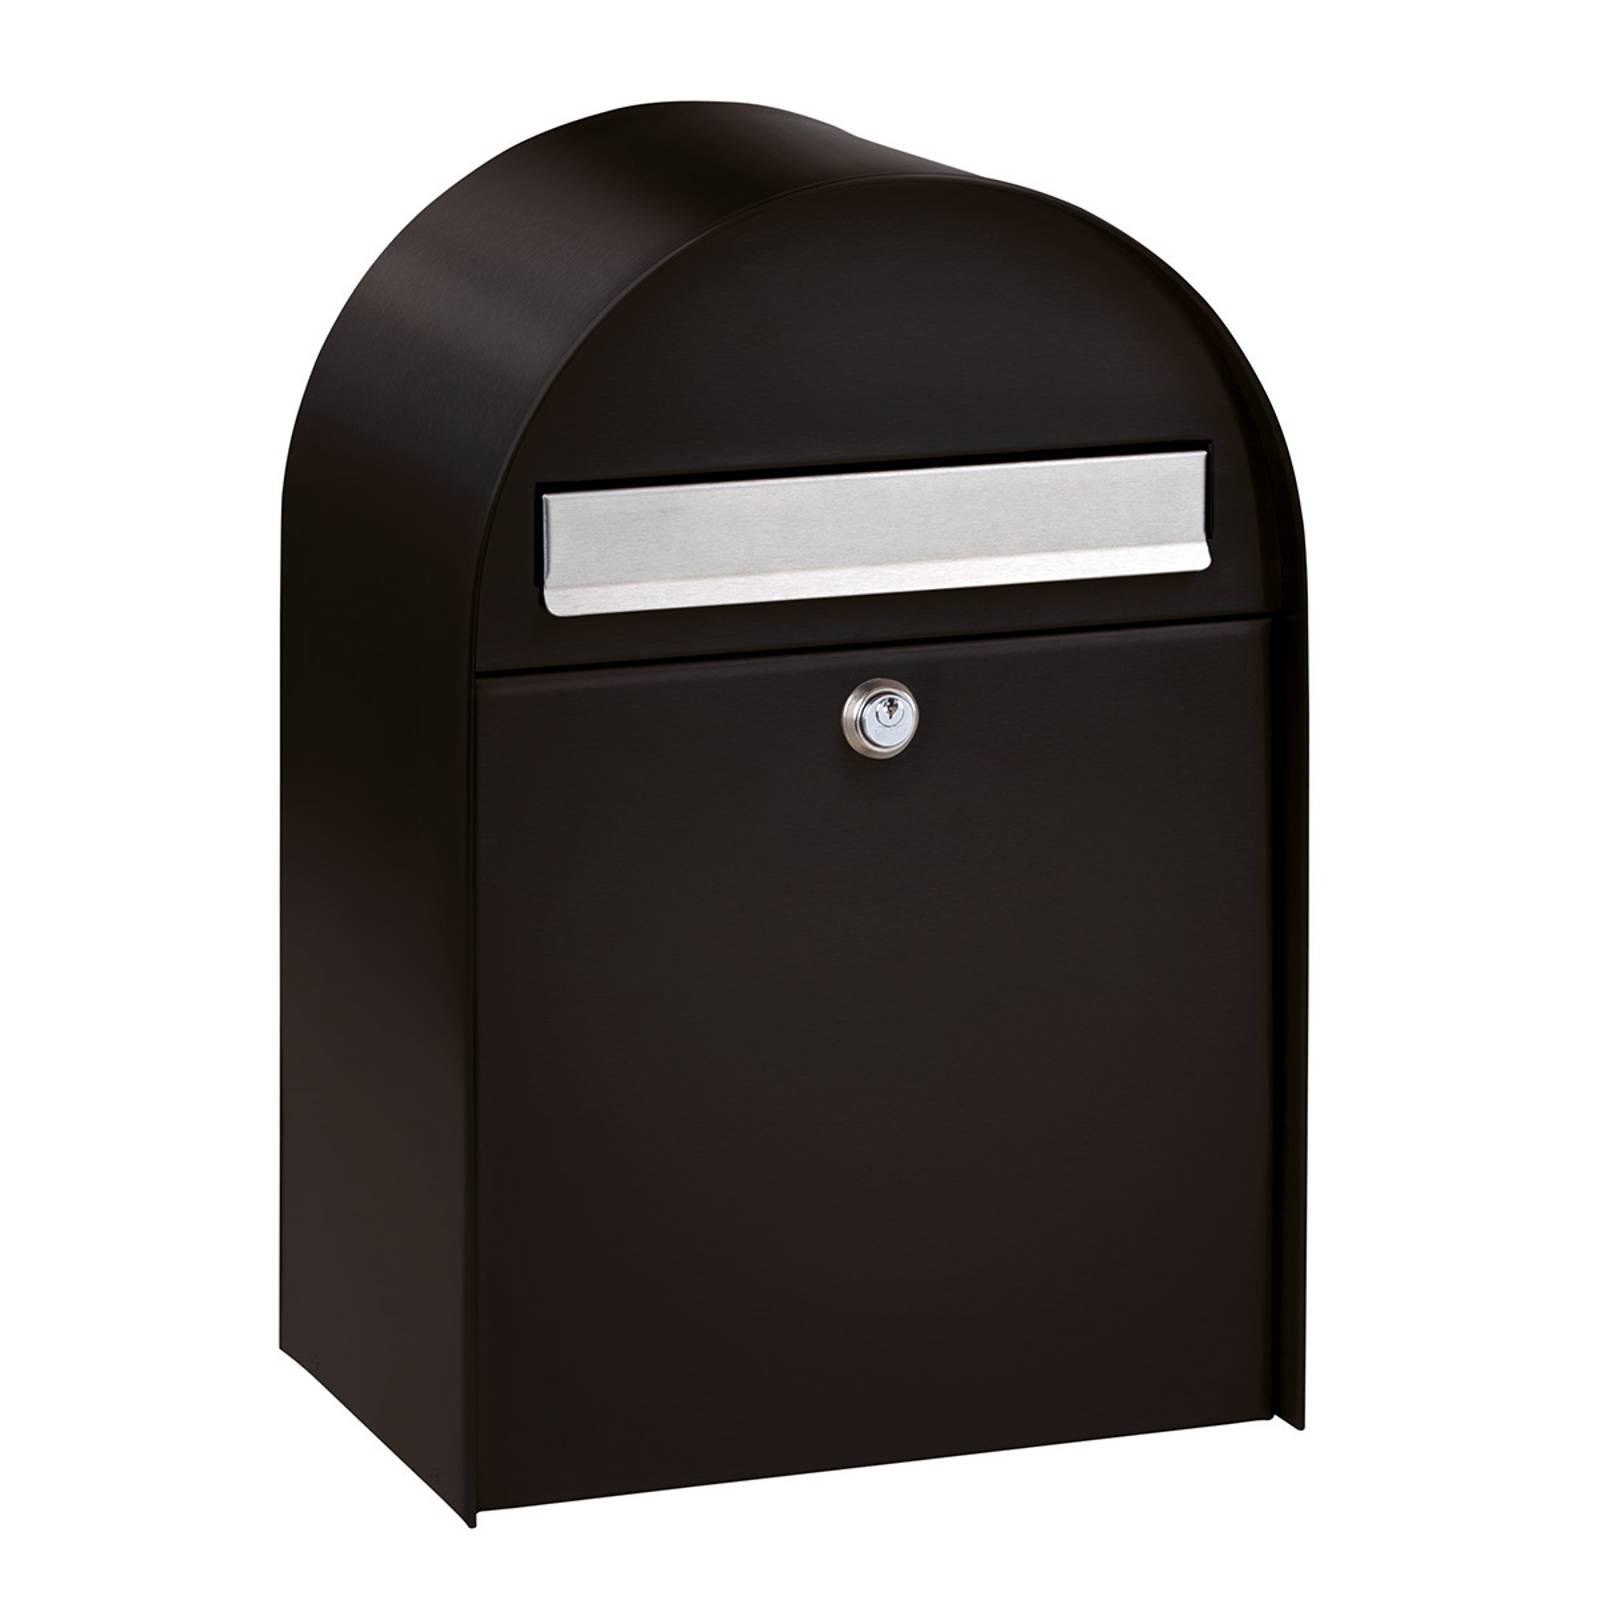 Tilava postilaatikko Nordic 680, musta